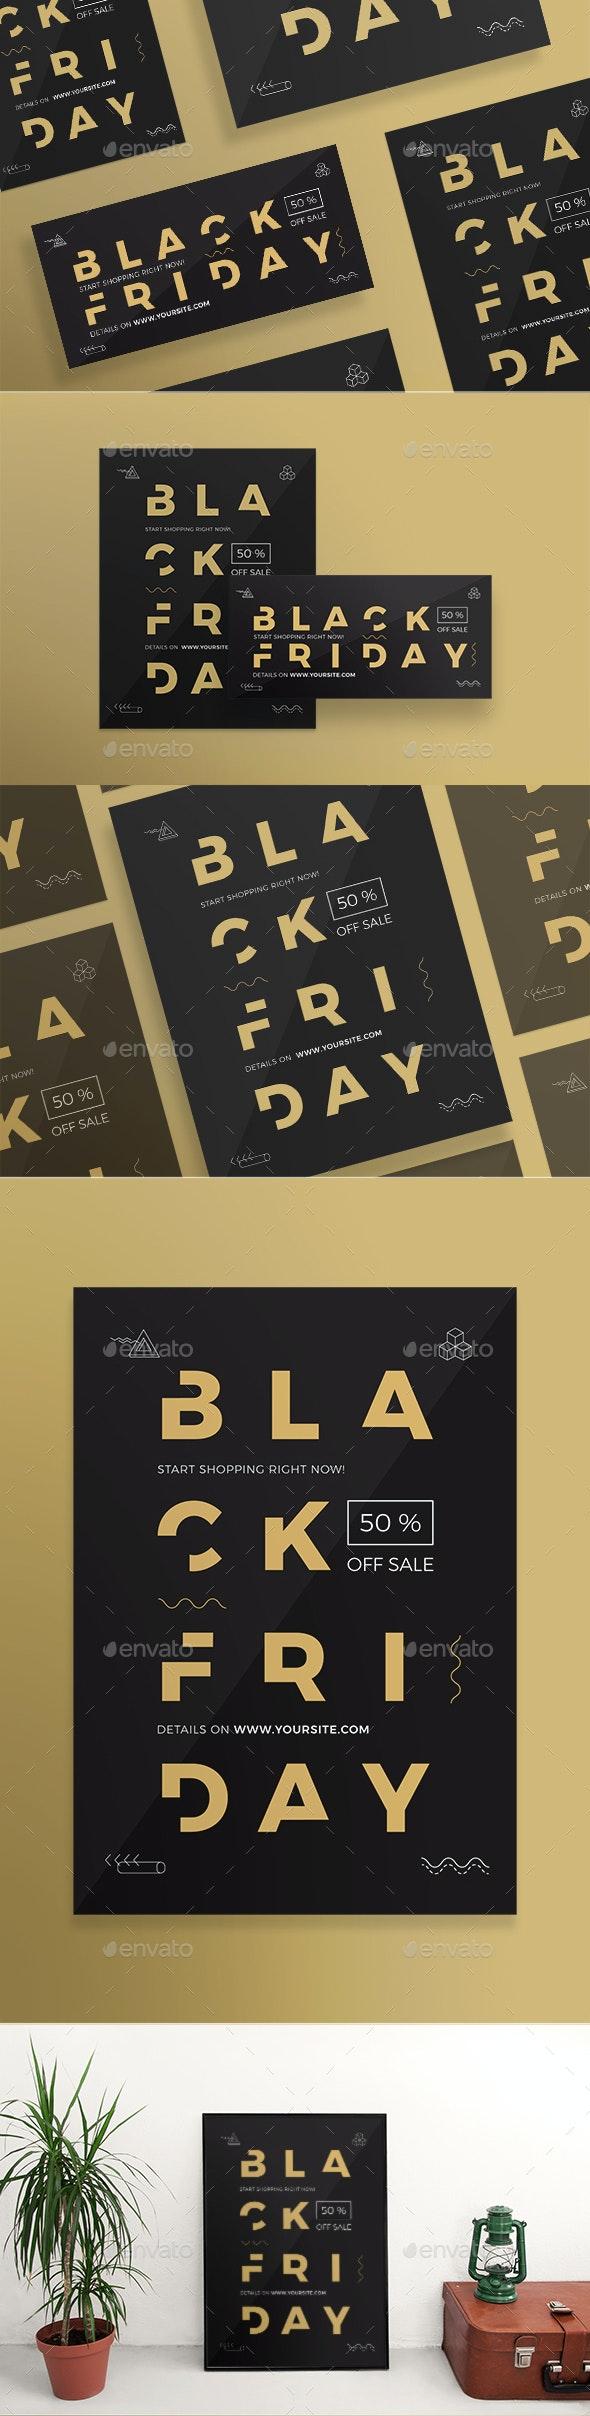 Black Friday Flyers - Holidays Events